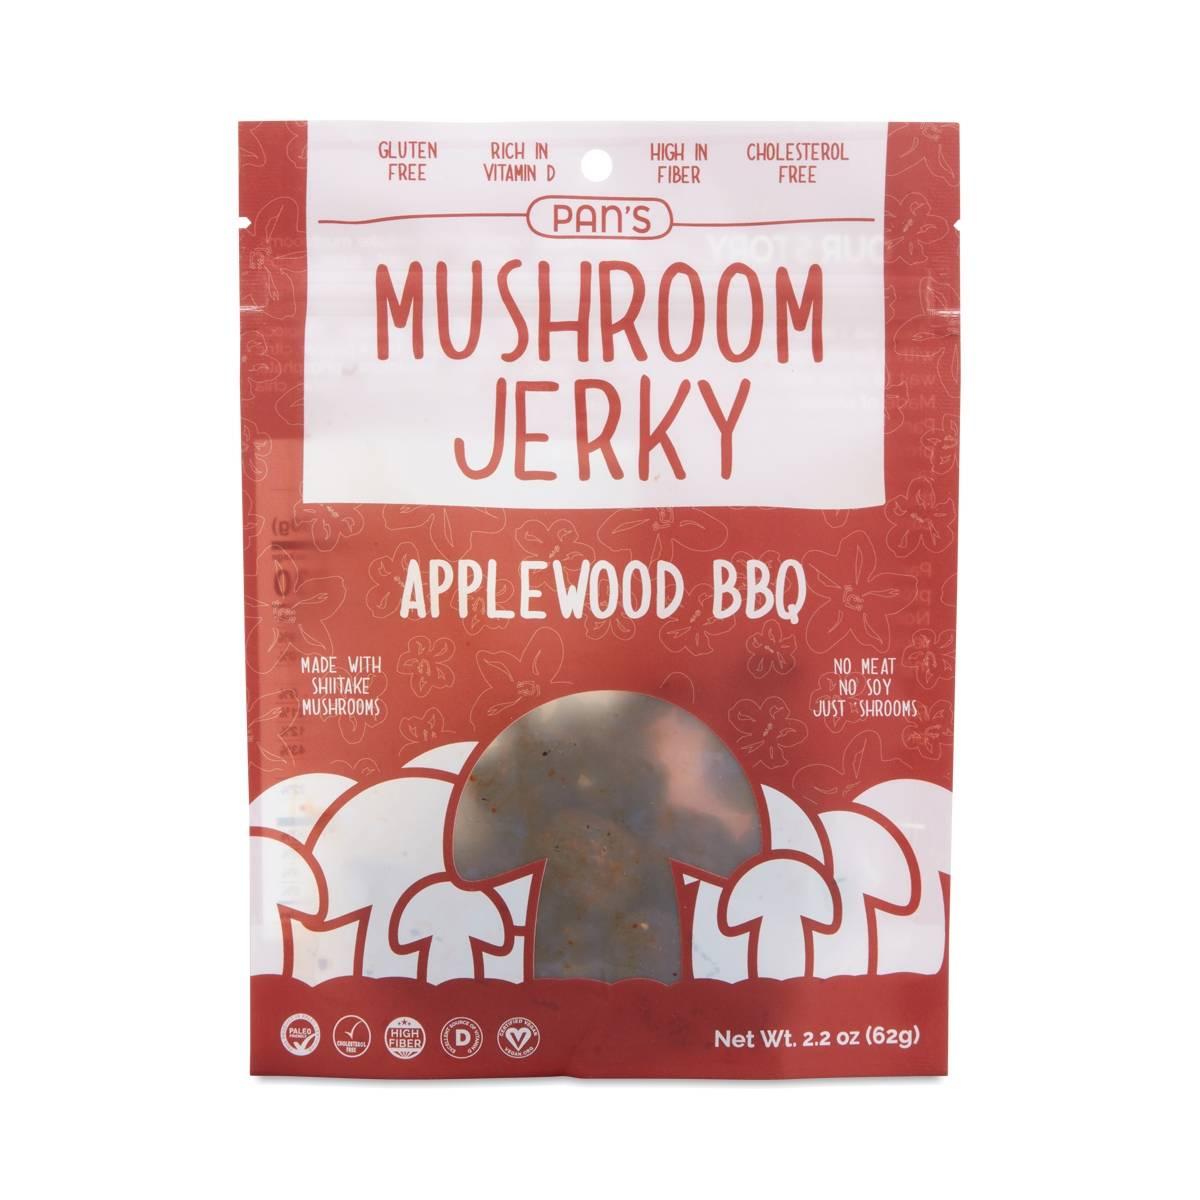 Pan's Mushroom Jerky Applewood BBQ Mushroom Jerky - Thrive Market